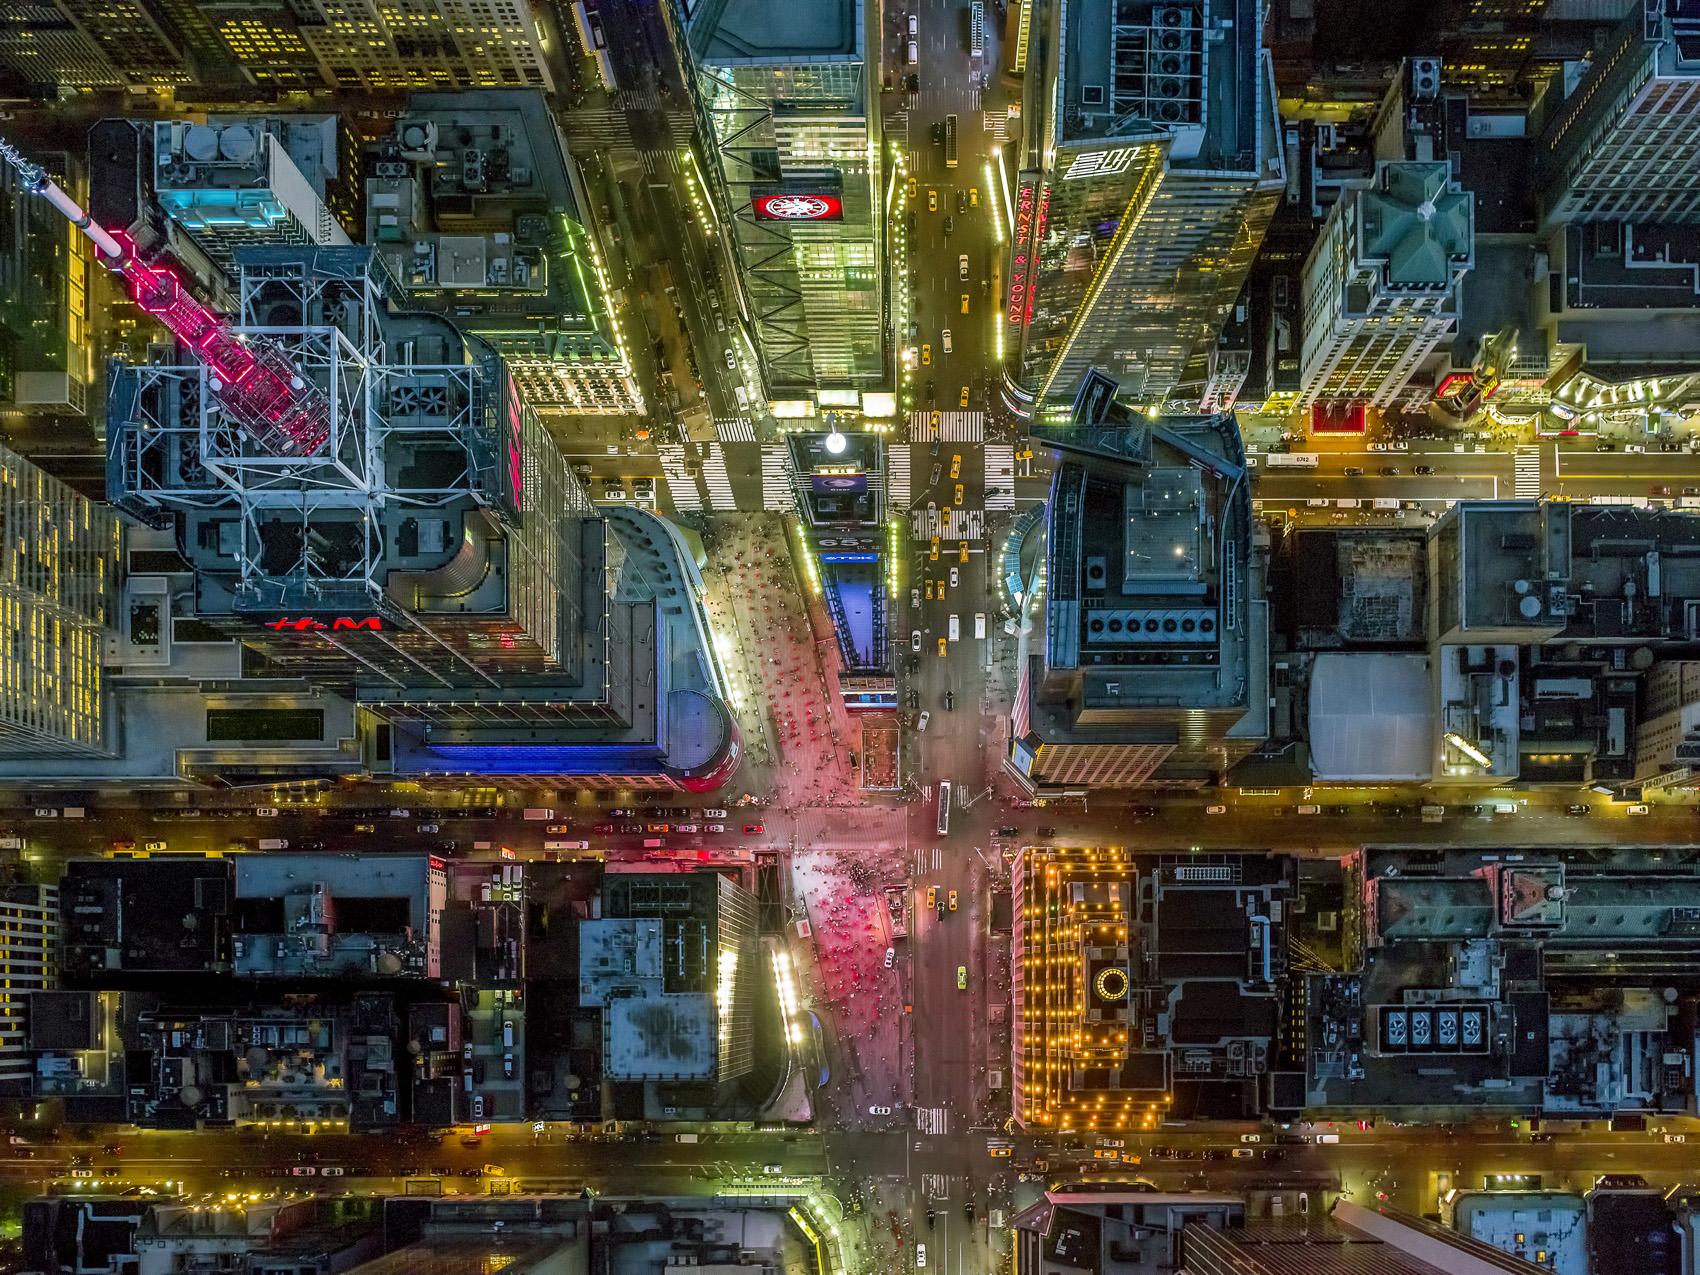 Aerial photographs Los Angeles New York City